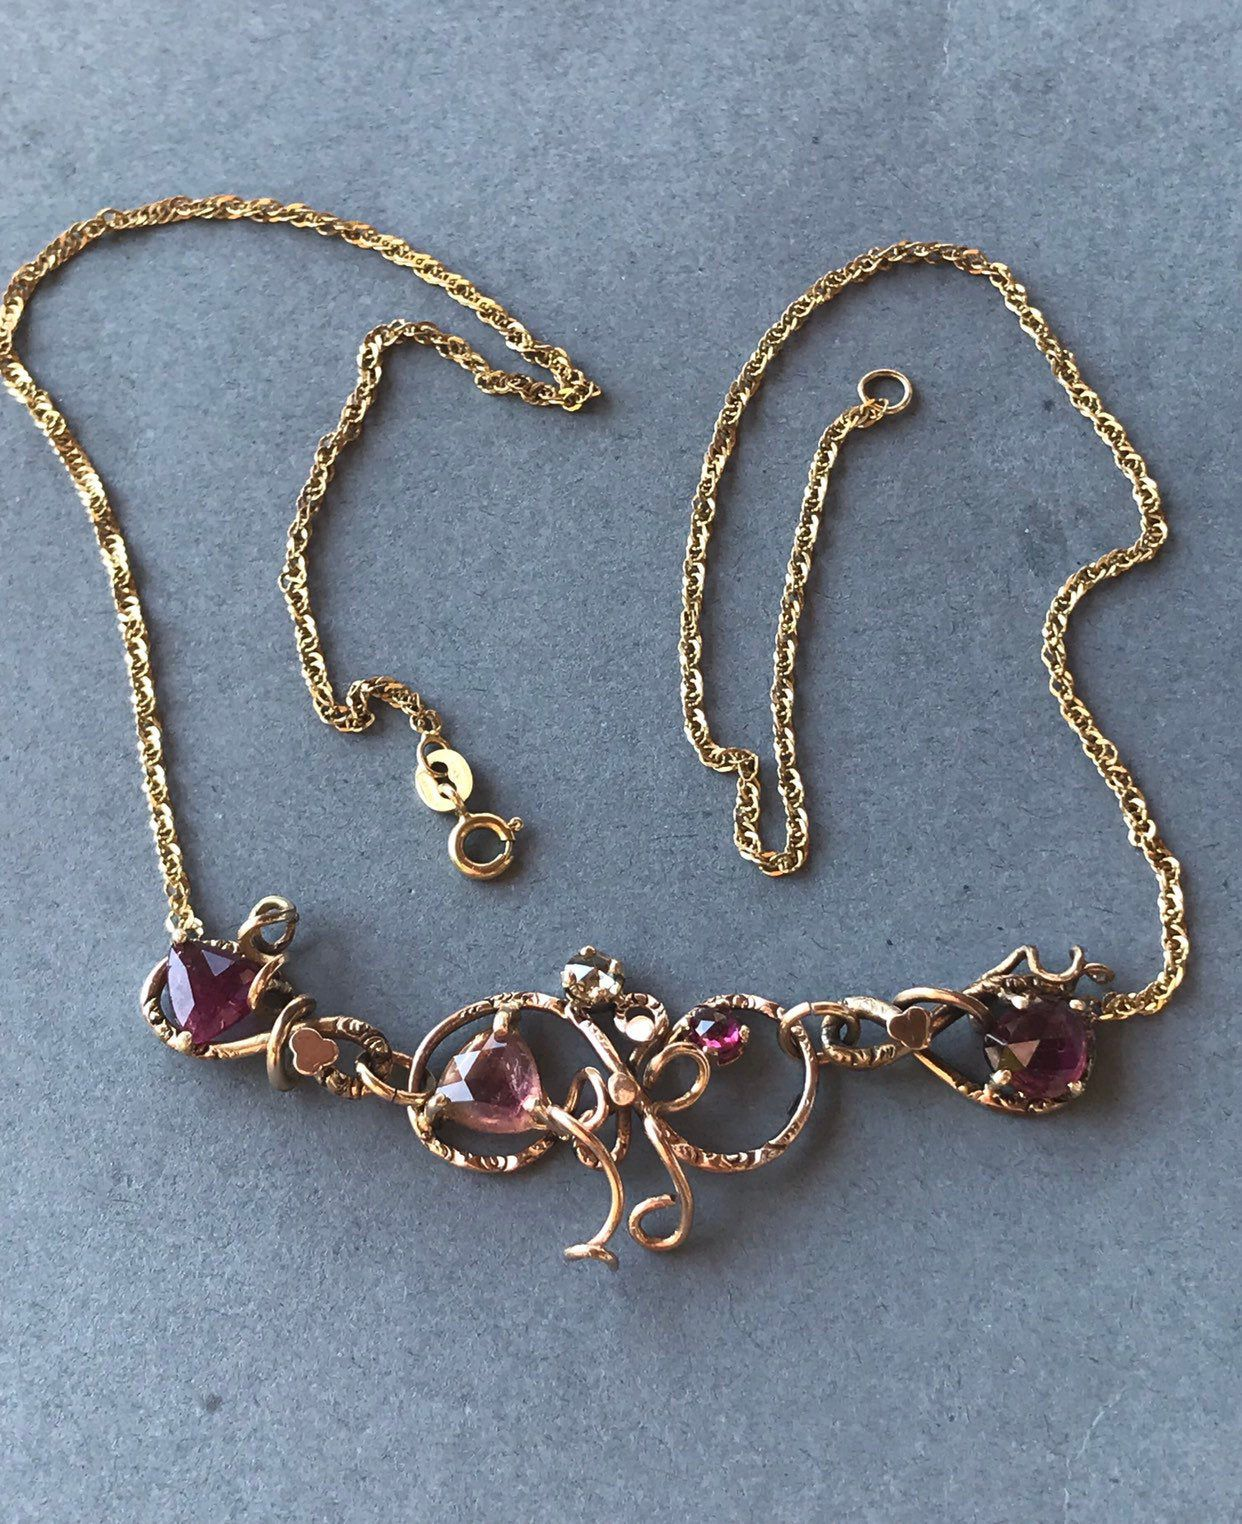 Antique Vintage 10k Rose Gold Tourmaline 14k Yellow Gold Chain Etsy Yellow Gold Chain Chain Statement Necklace Jewelry Questions